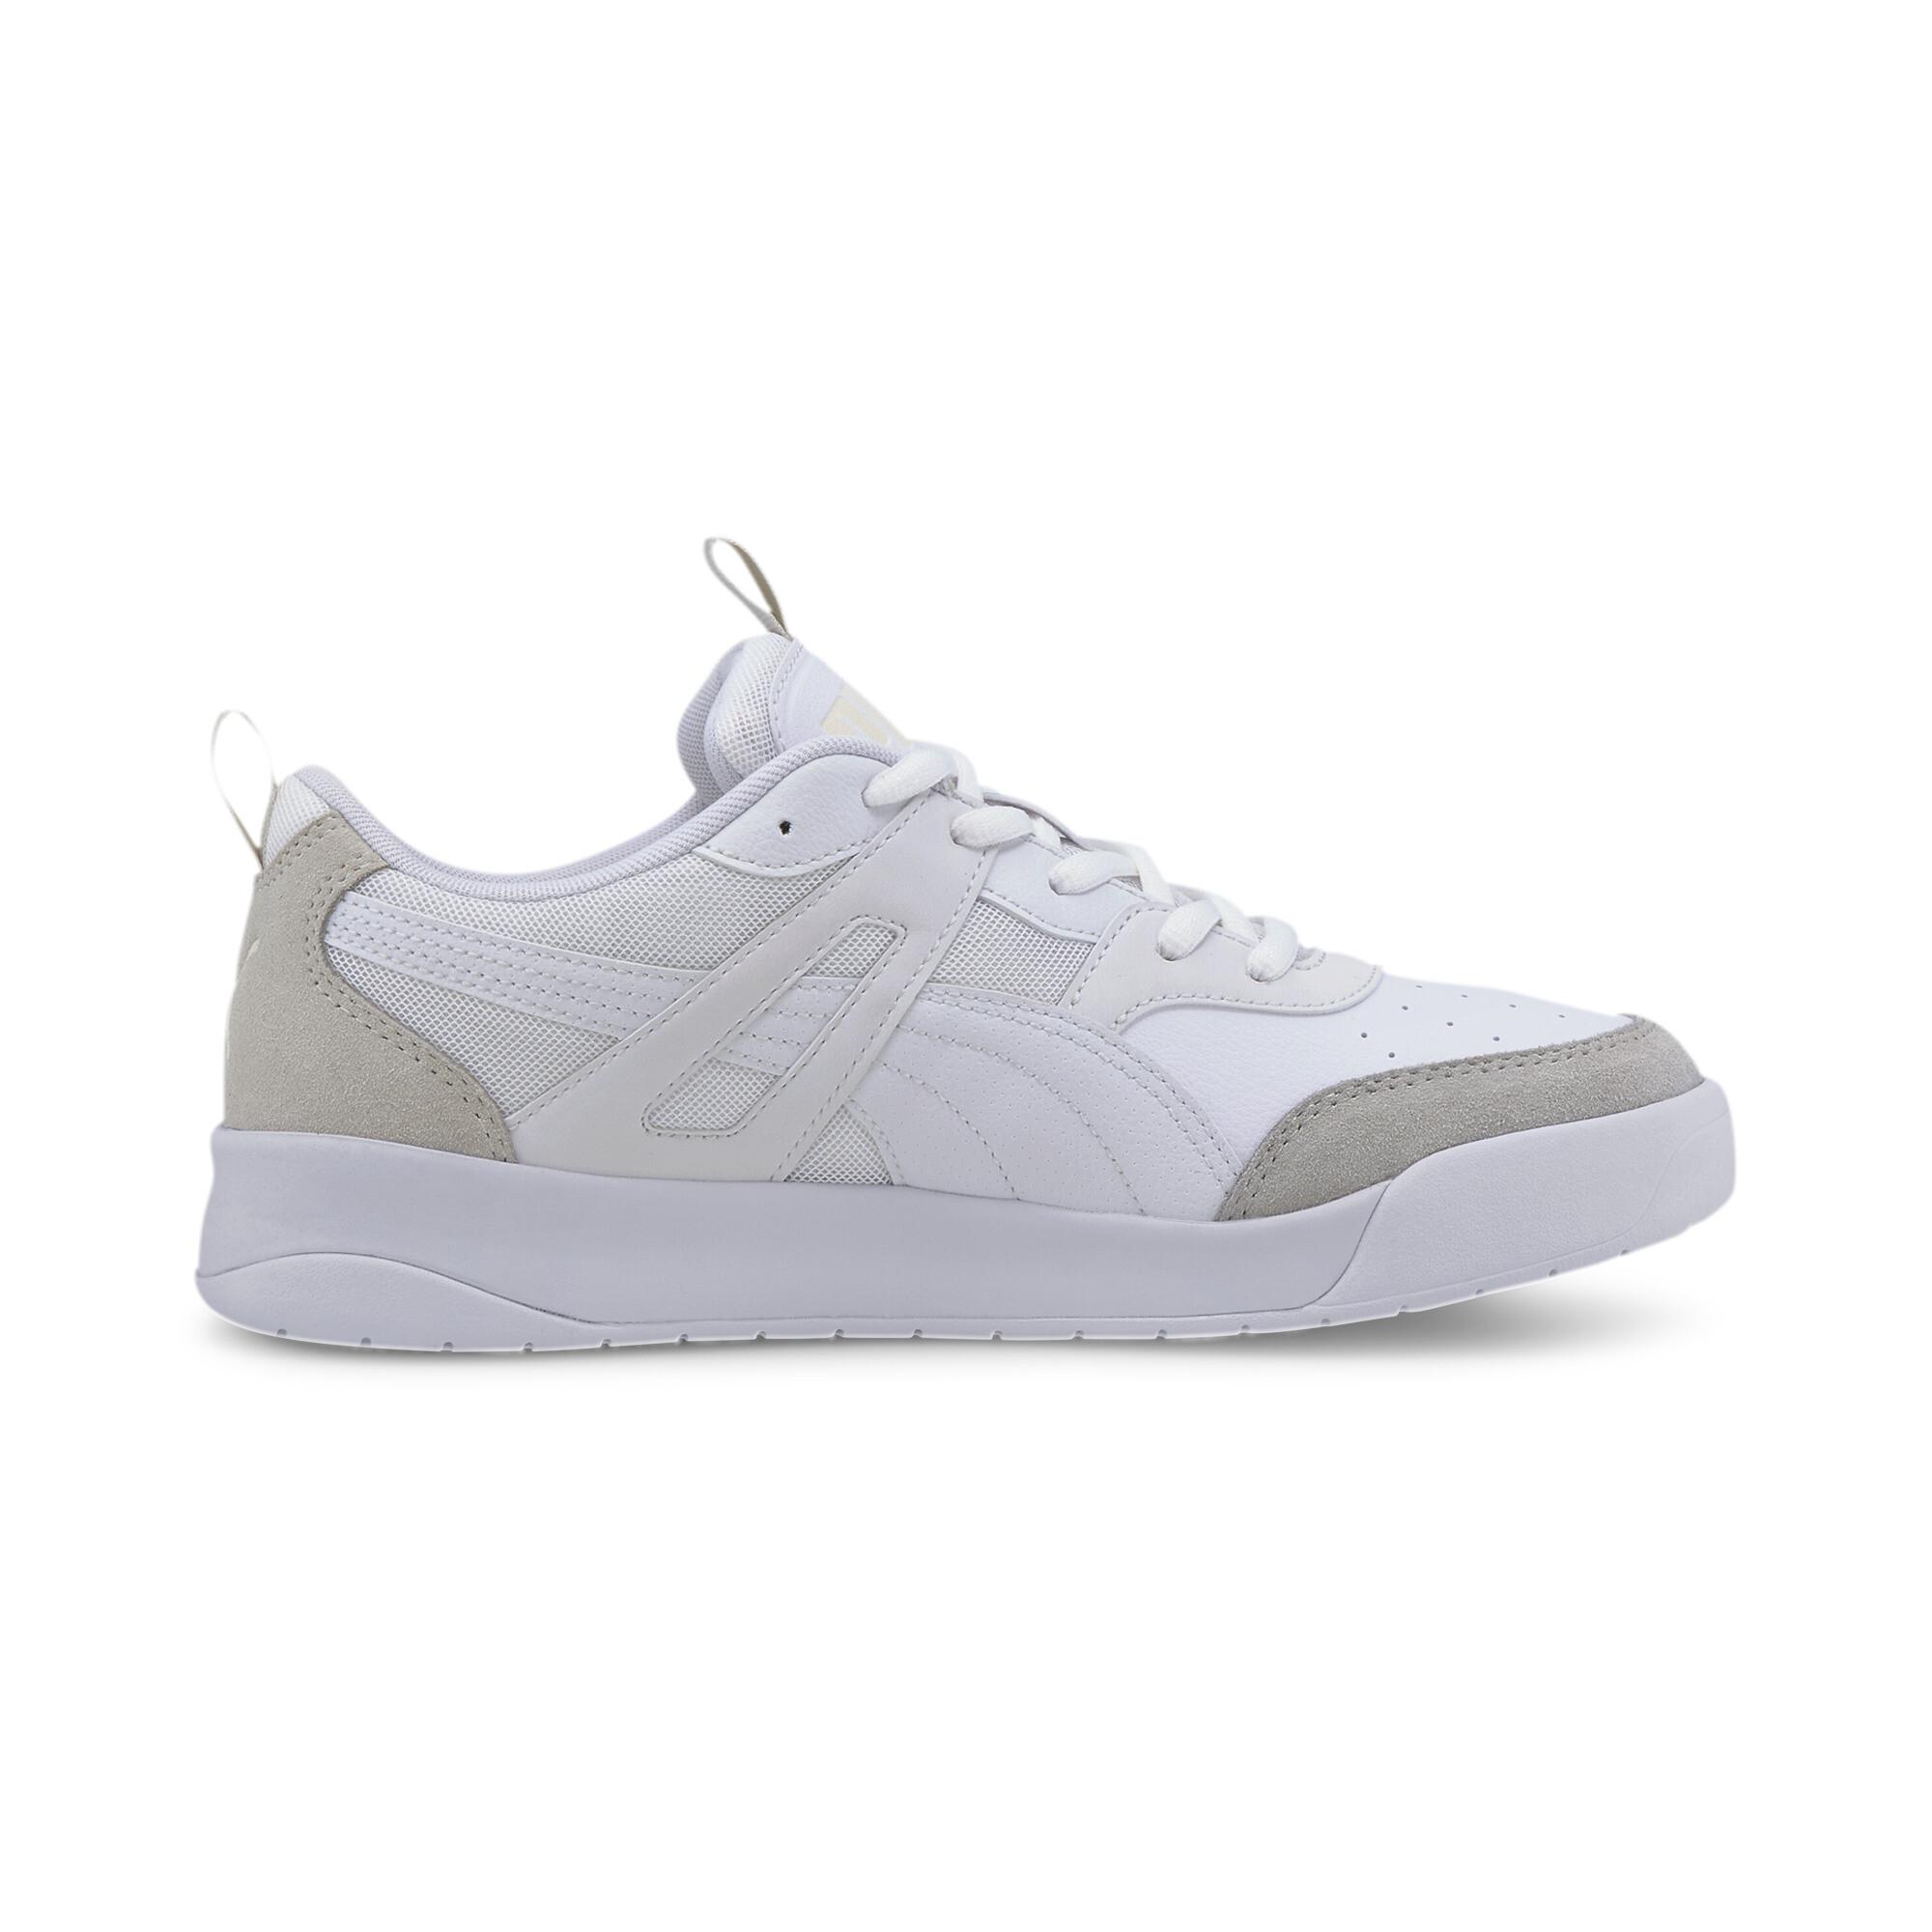 miniature 15 - Puma Men's Backcourt Sneakers